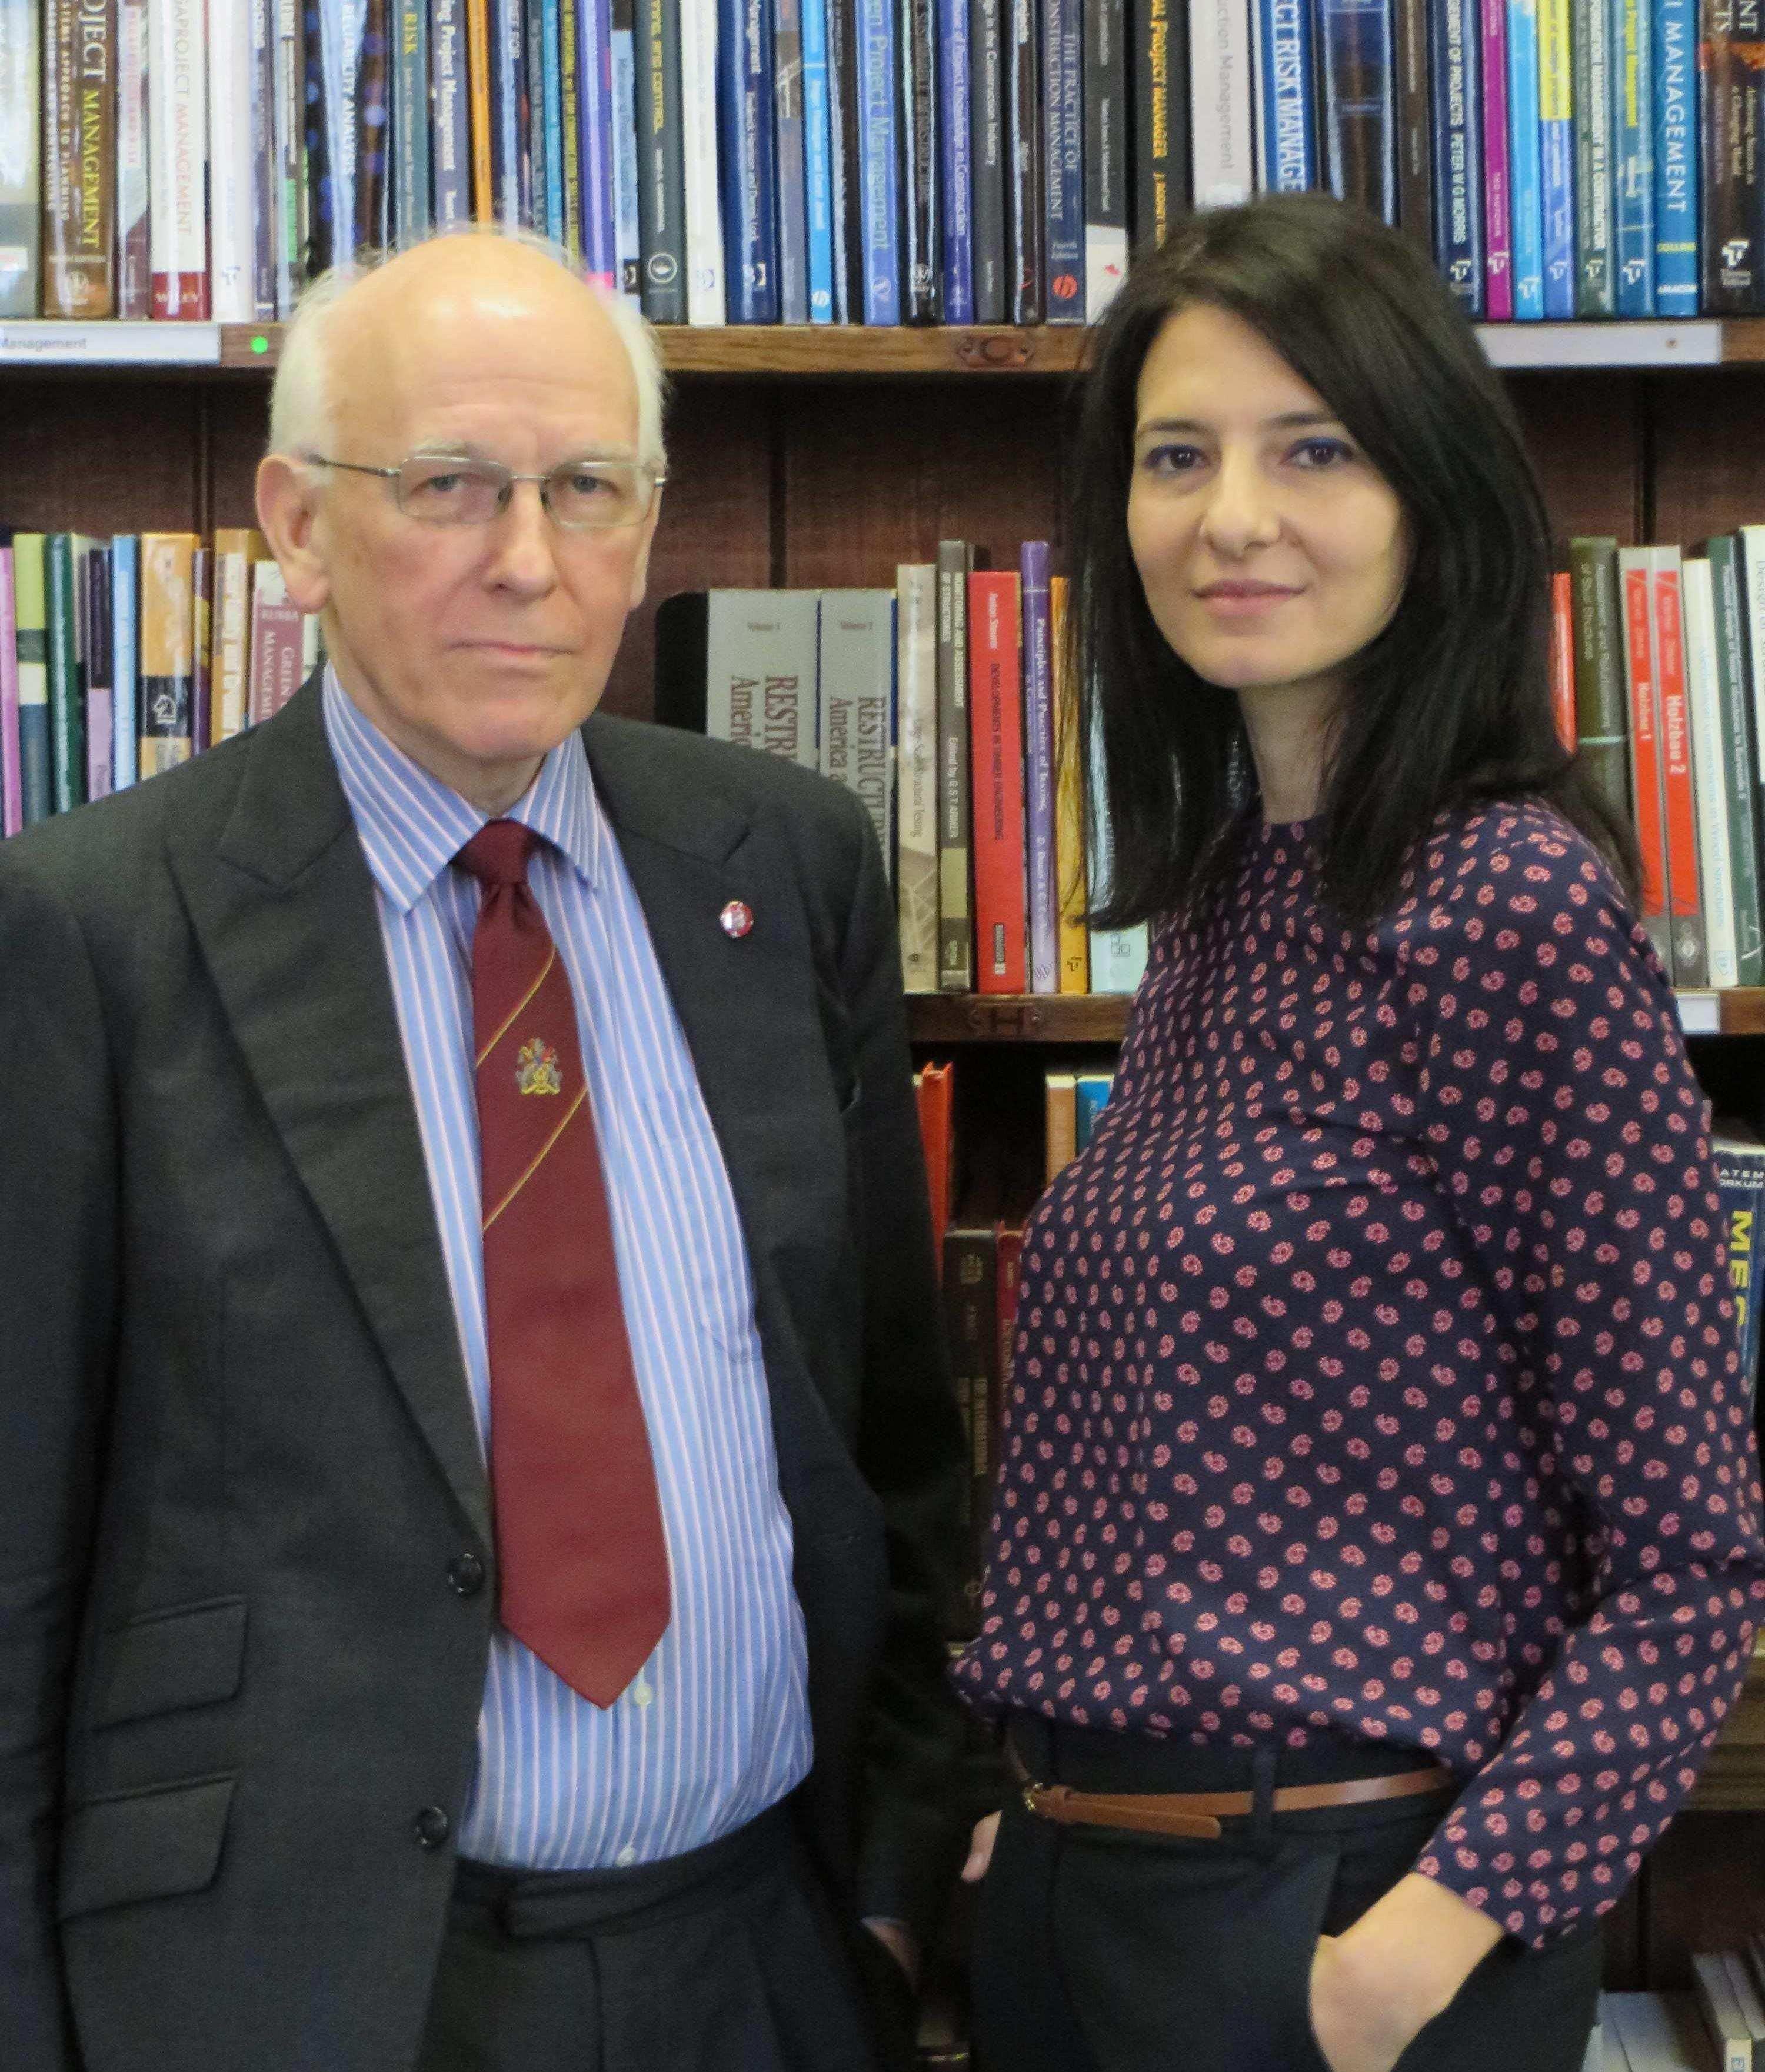 David Meggitt and Christie Sarri